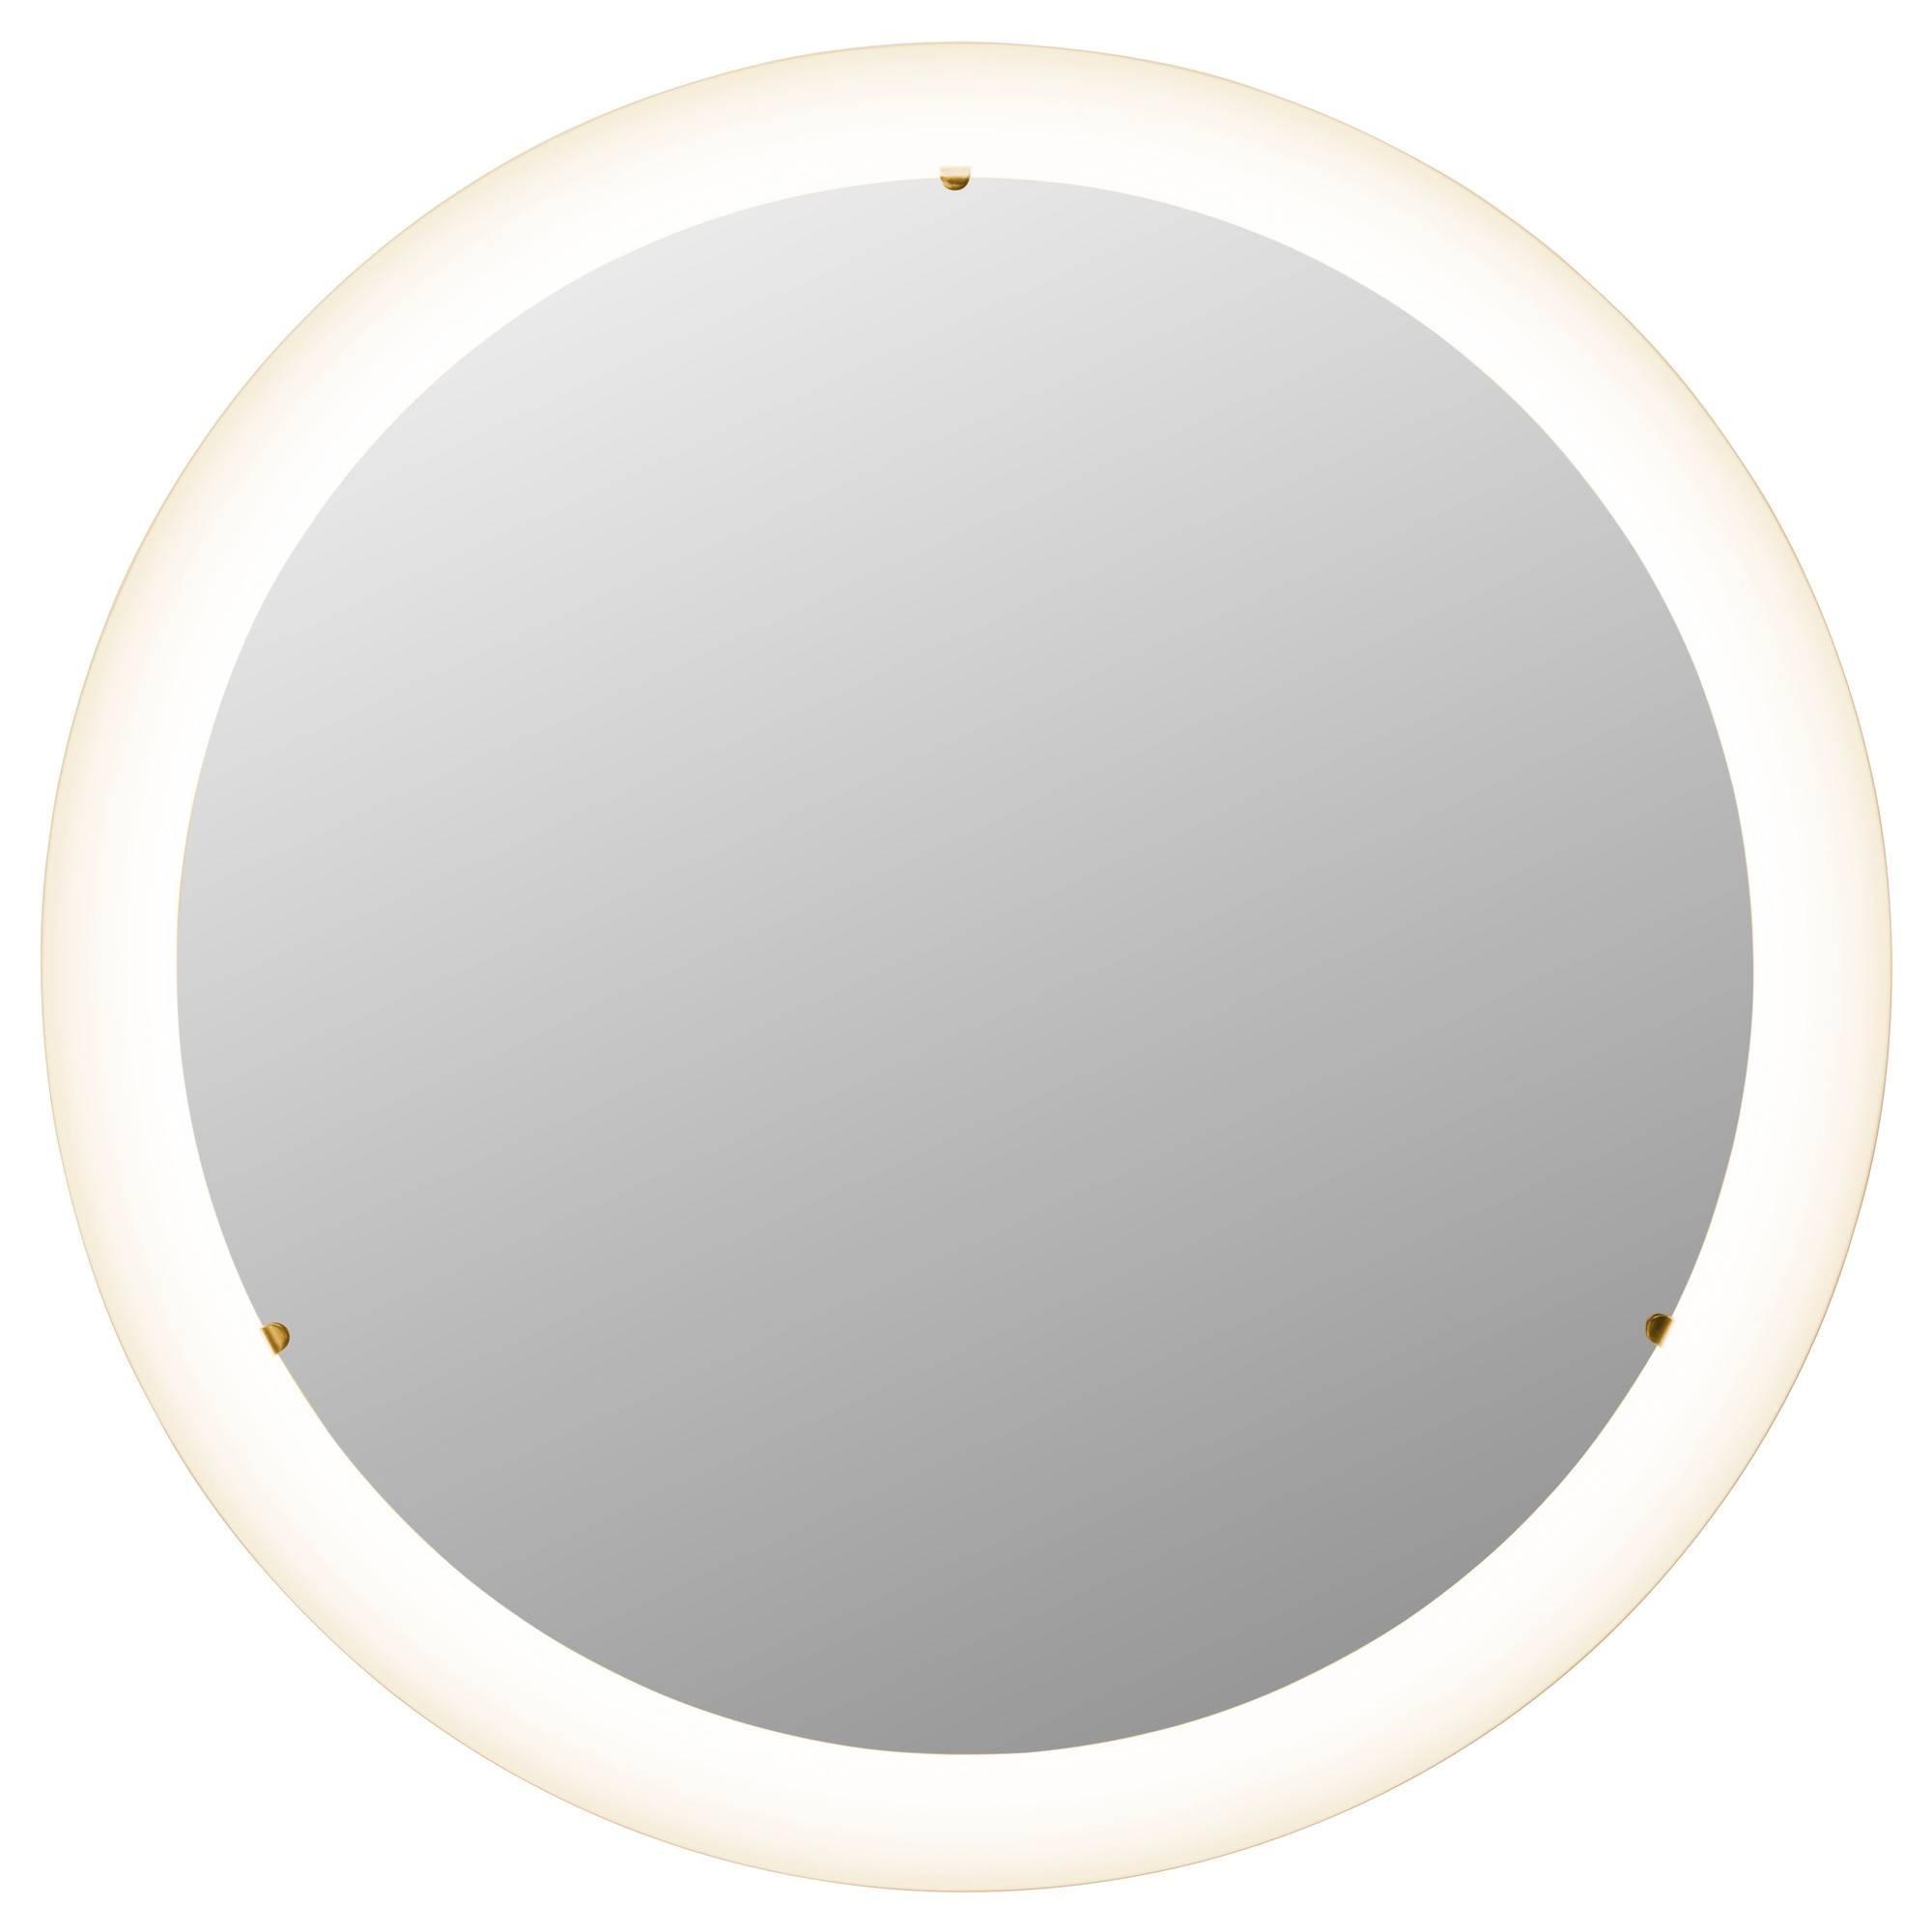 Bathroom Mirrors & Large Bathroom Mirrors - Ikea pertaining to White Round Mirrors (Image 4 of 15)